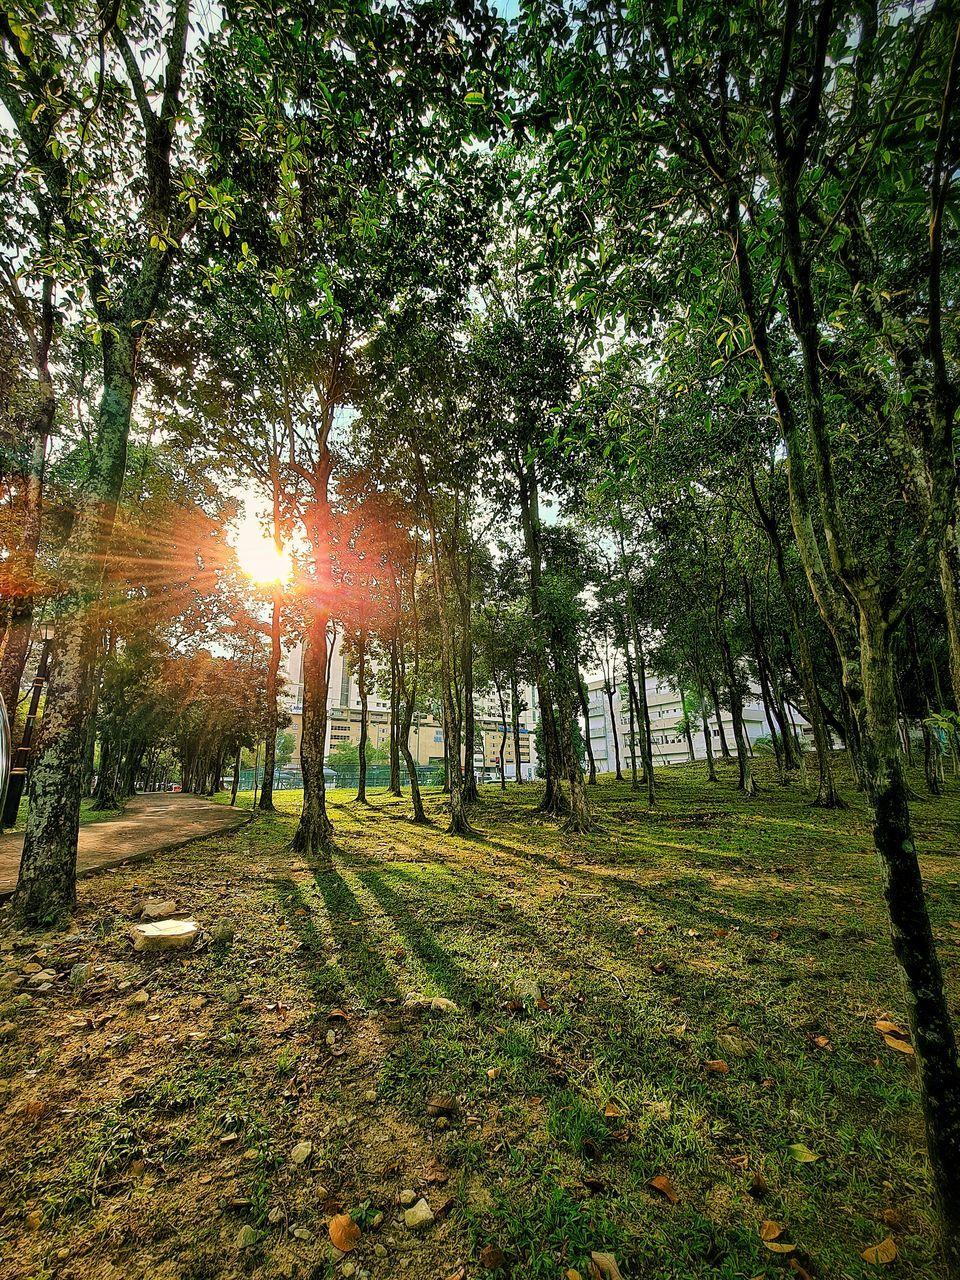 SUNLIGHT STREAMING THROUGH TREE